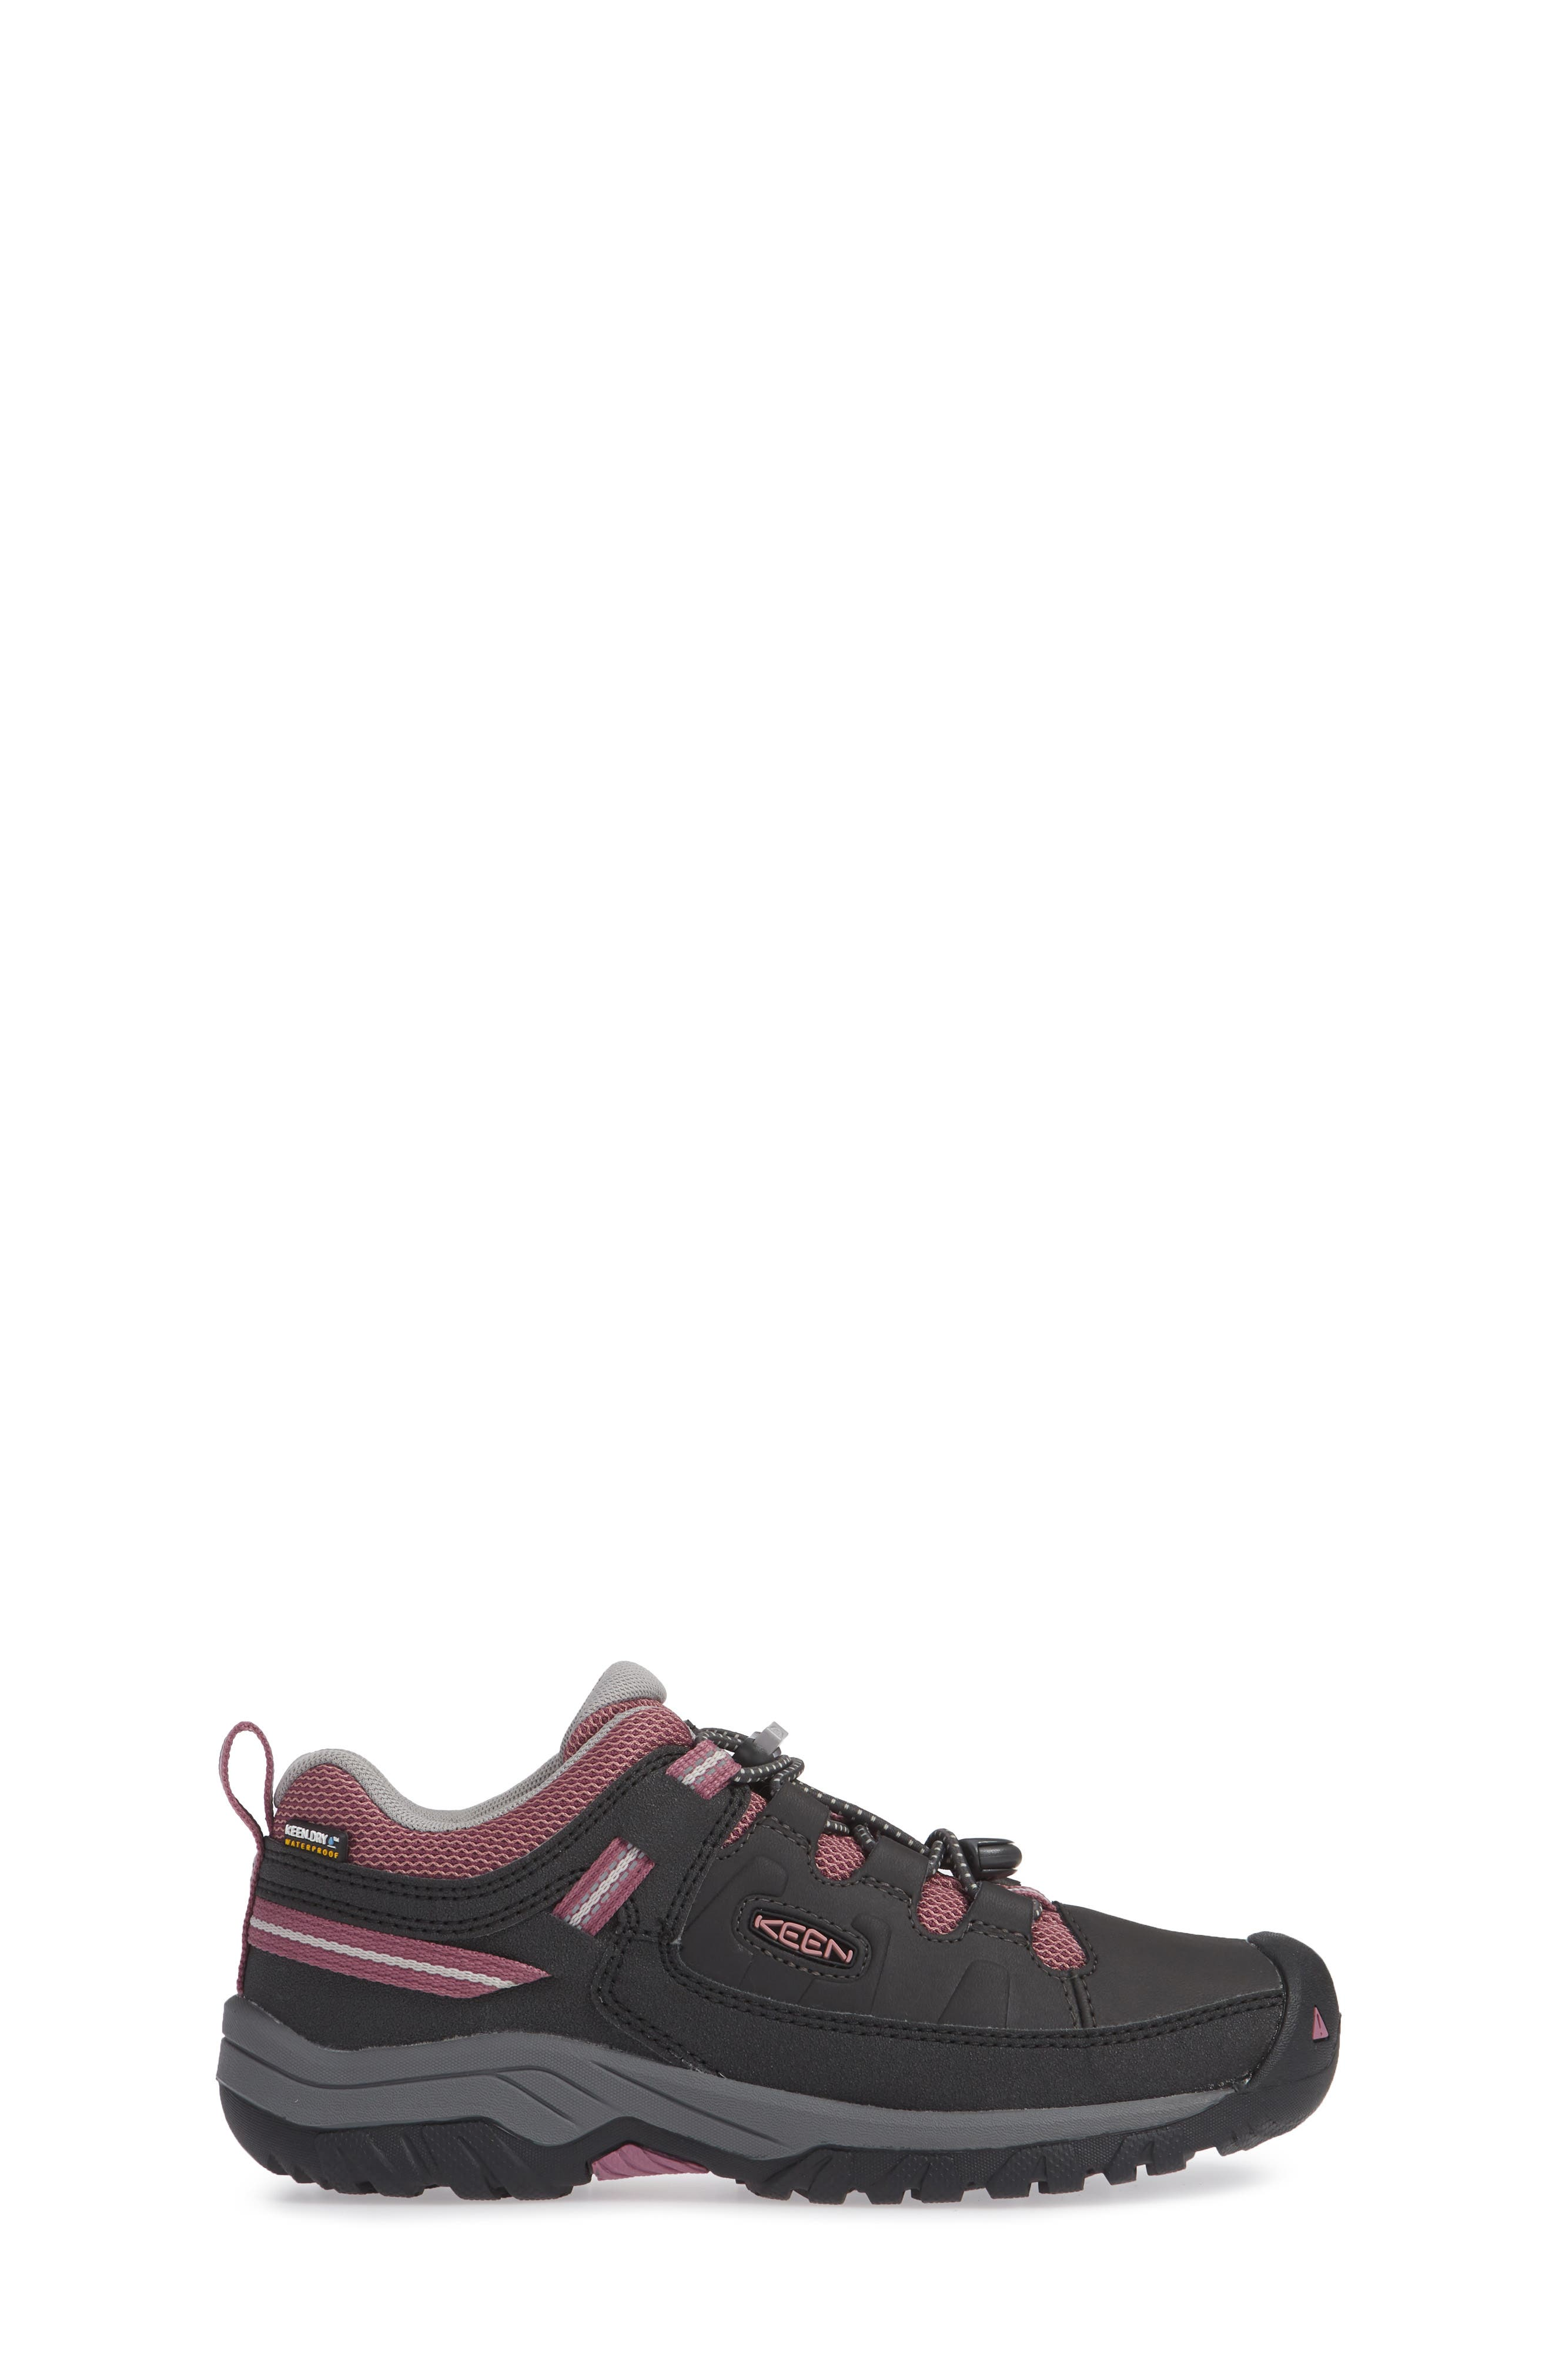 Targhee Low Waterproof Boots,                             Alternate thumbnail 3, color,                             RAVEN/ TULIPWOOD/ TULIPWOOD